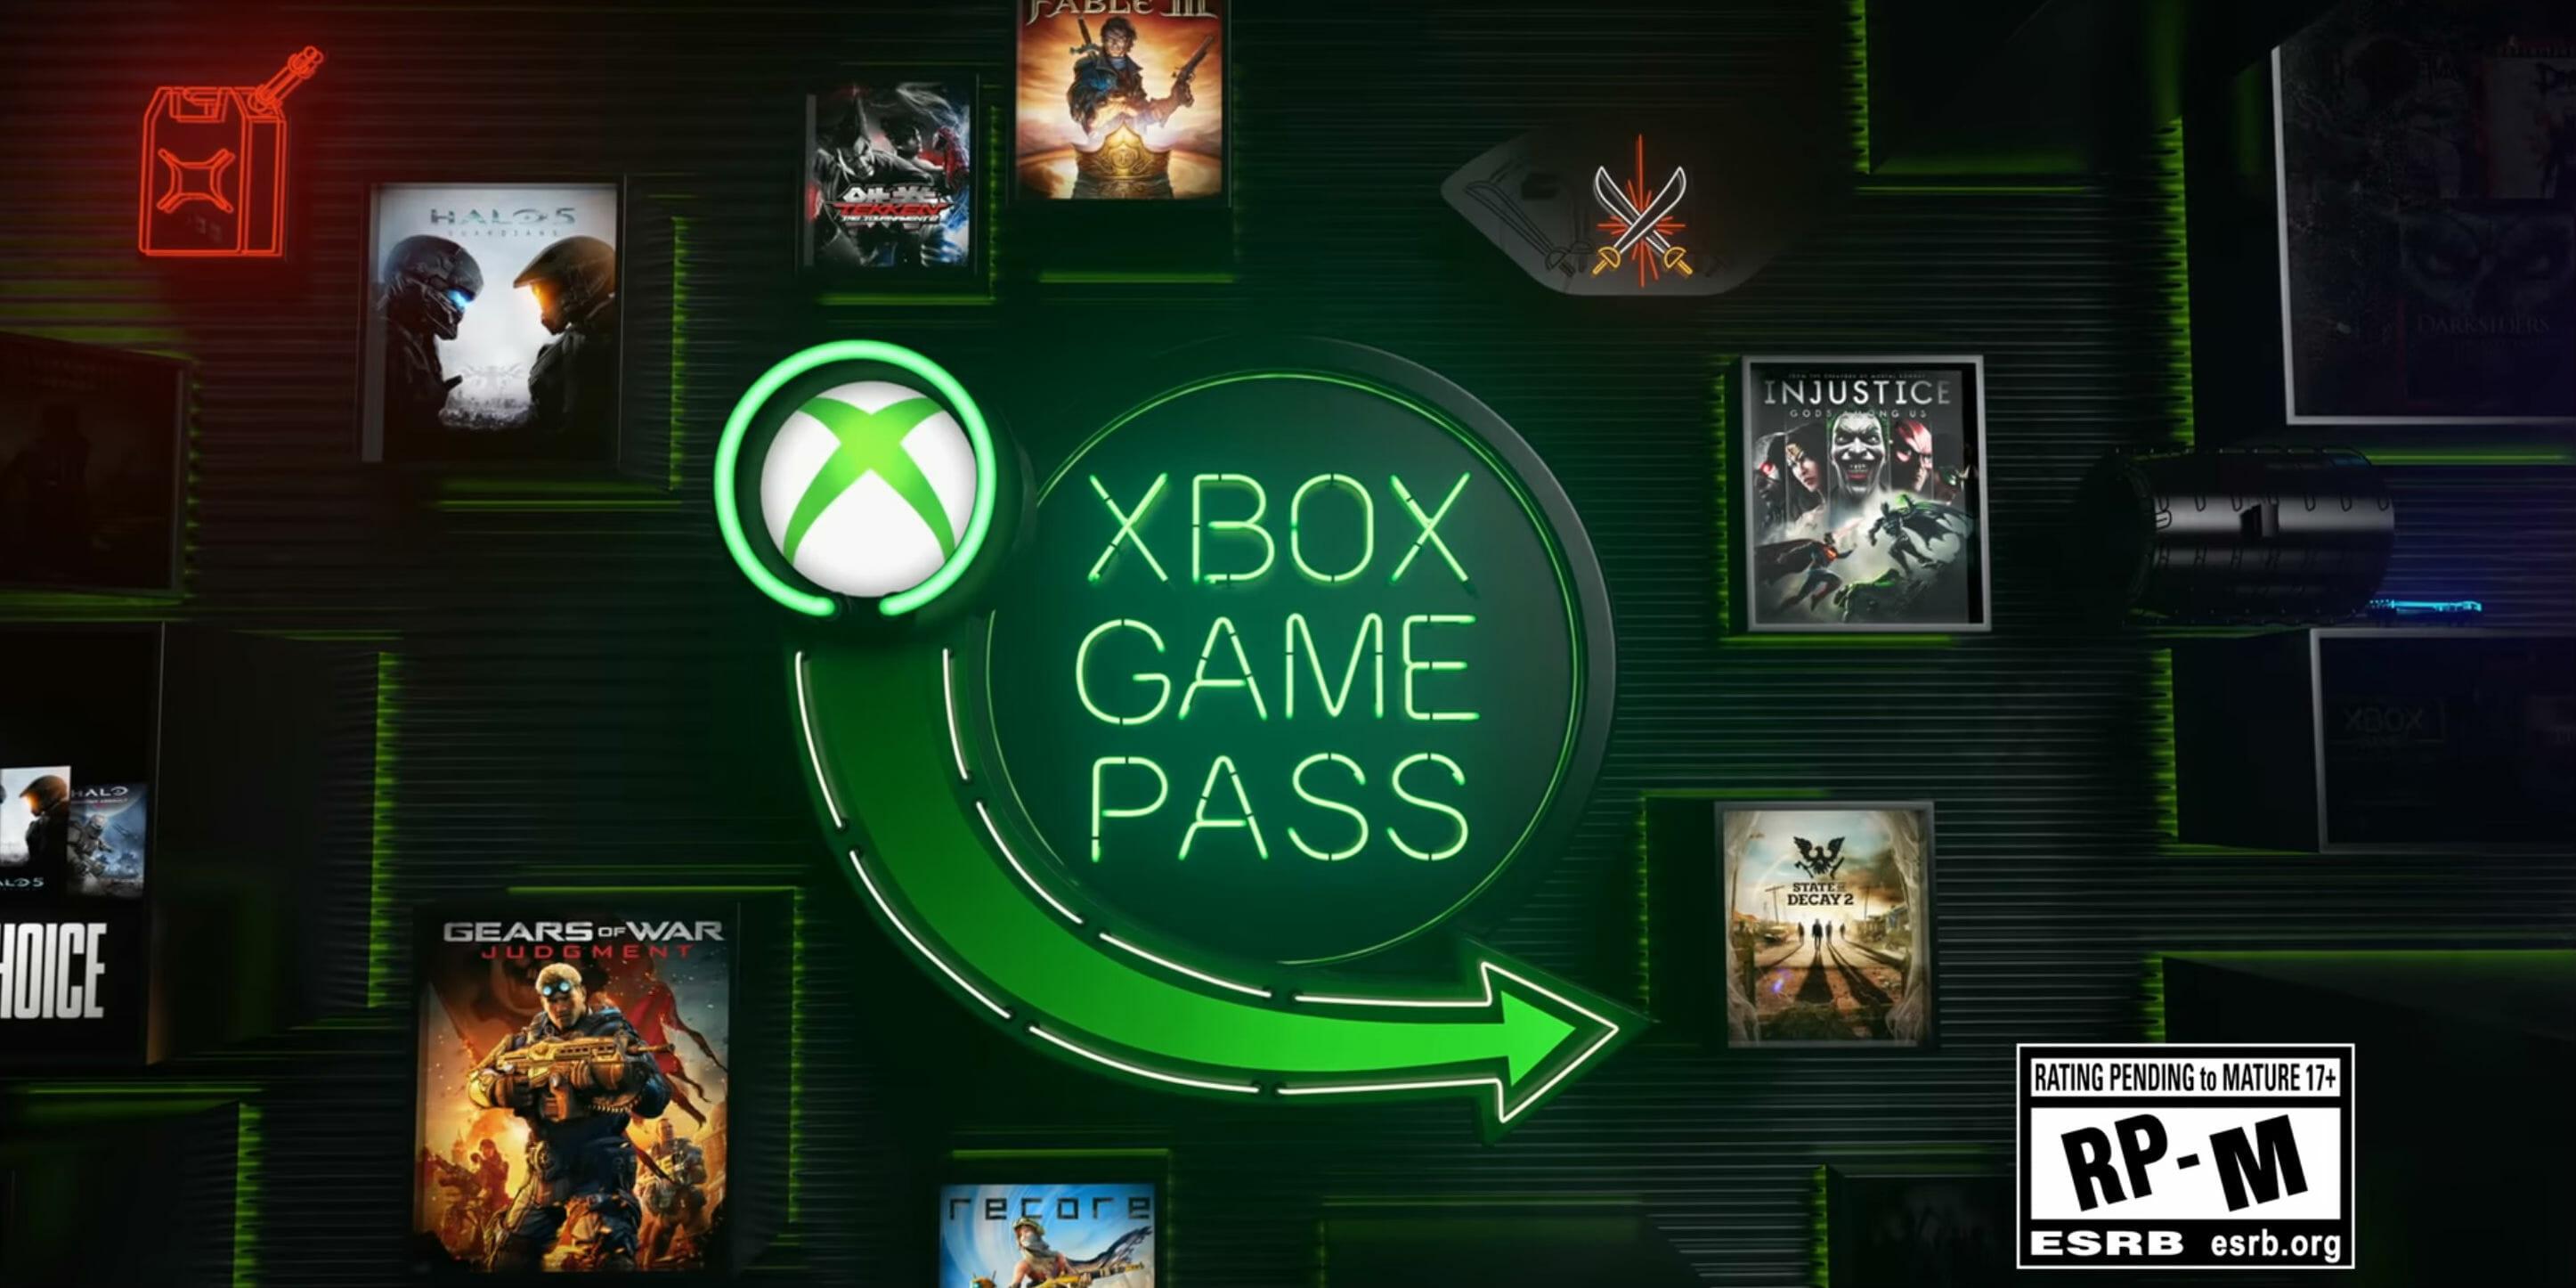 https://i2.wp.com/www.dailydot.com/wp-content/uploads/2019/04/xbox-game-pass-ultimate.jpg?w=3000&ssl=1